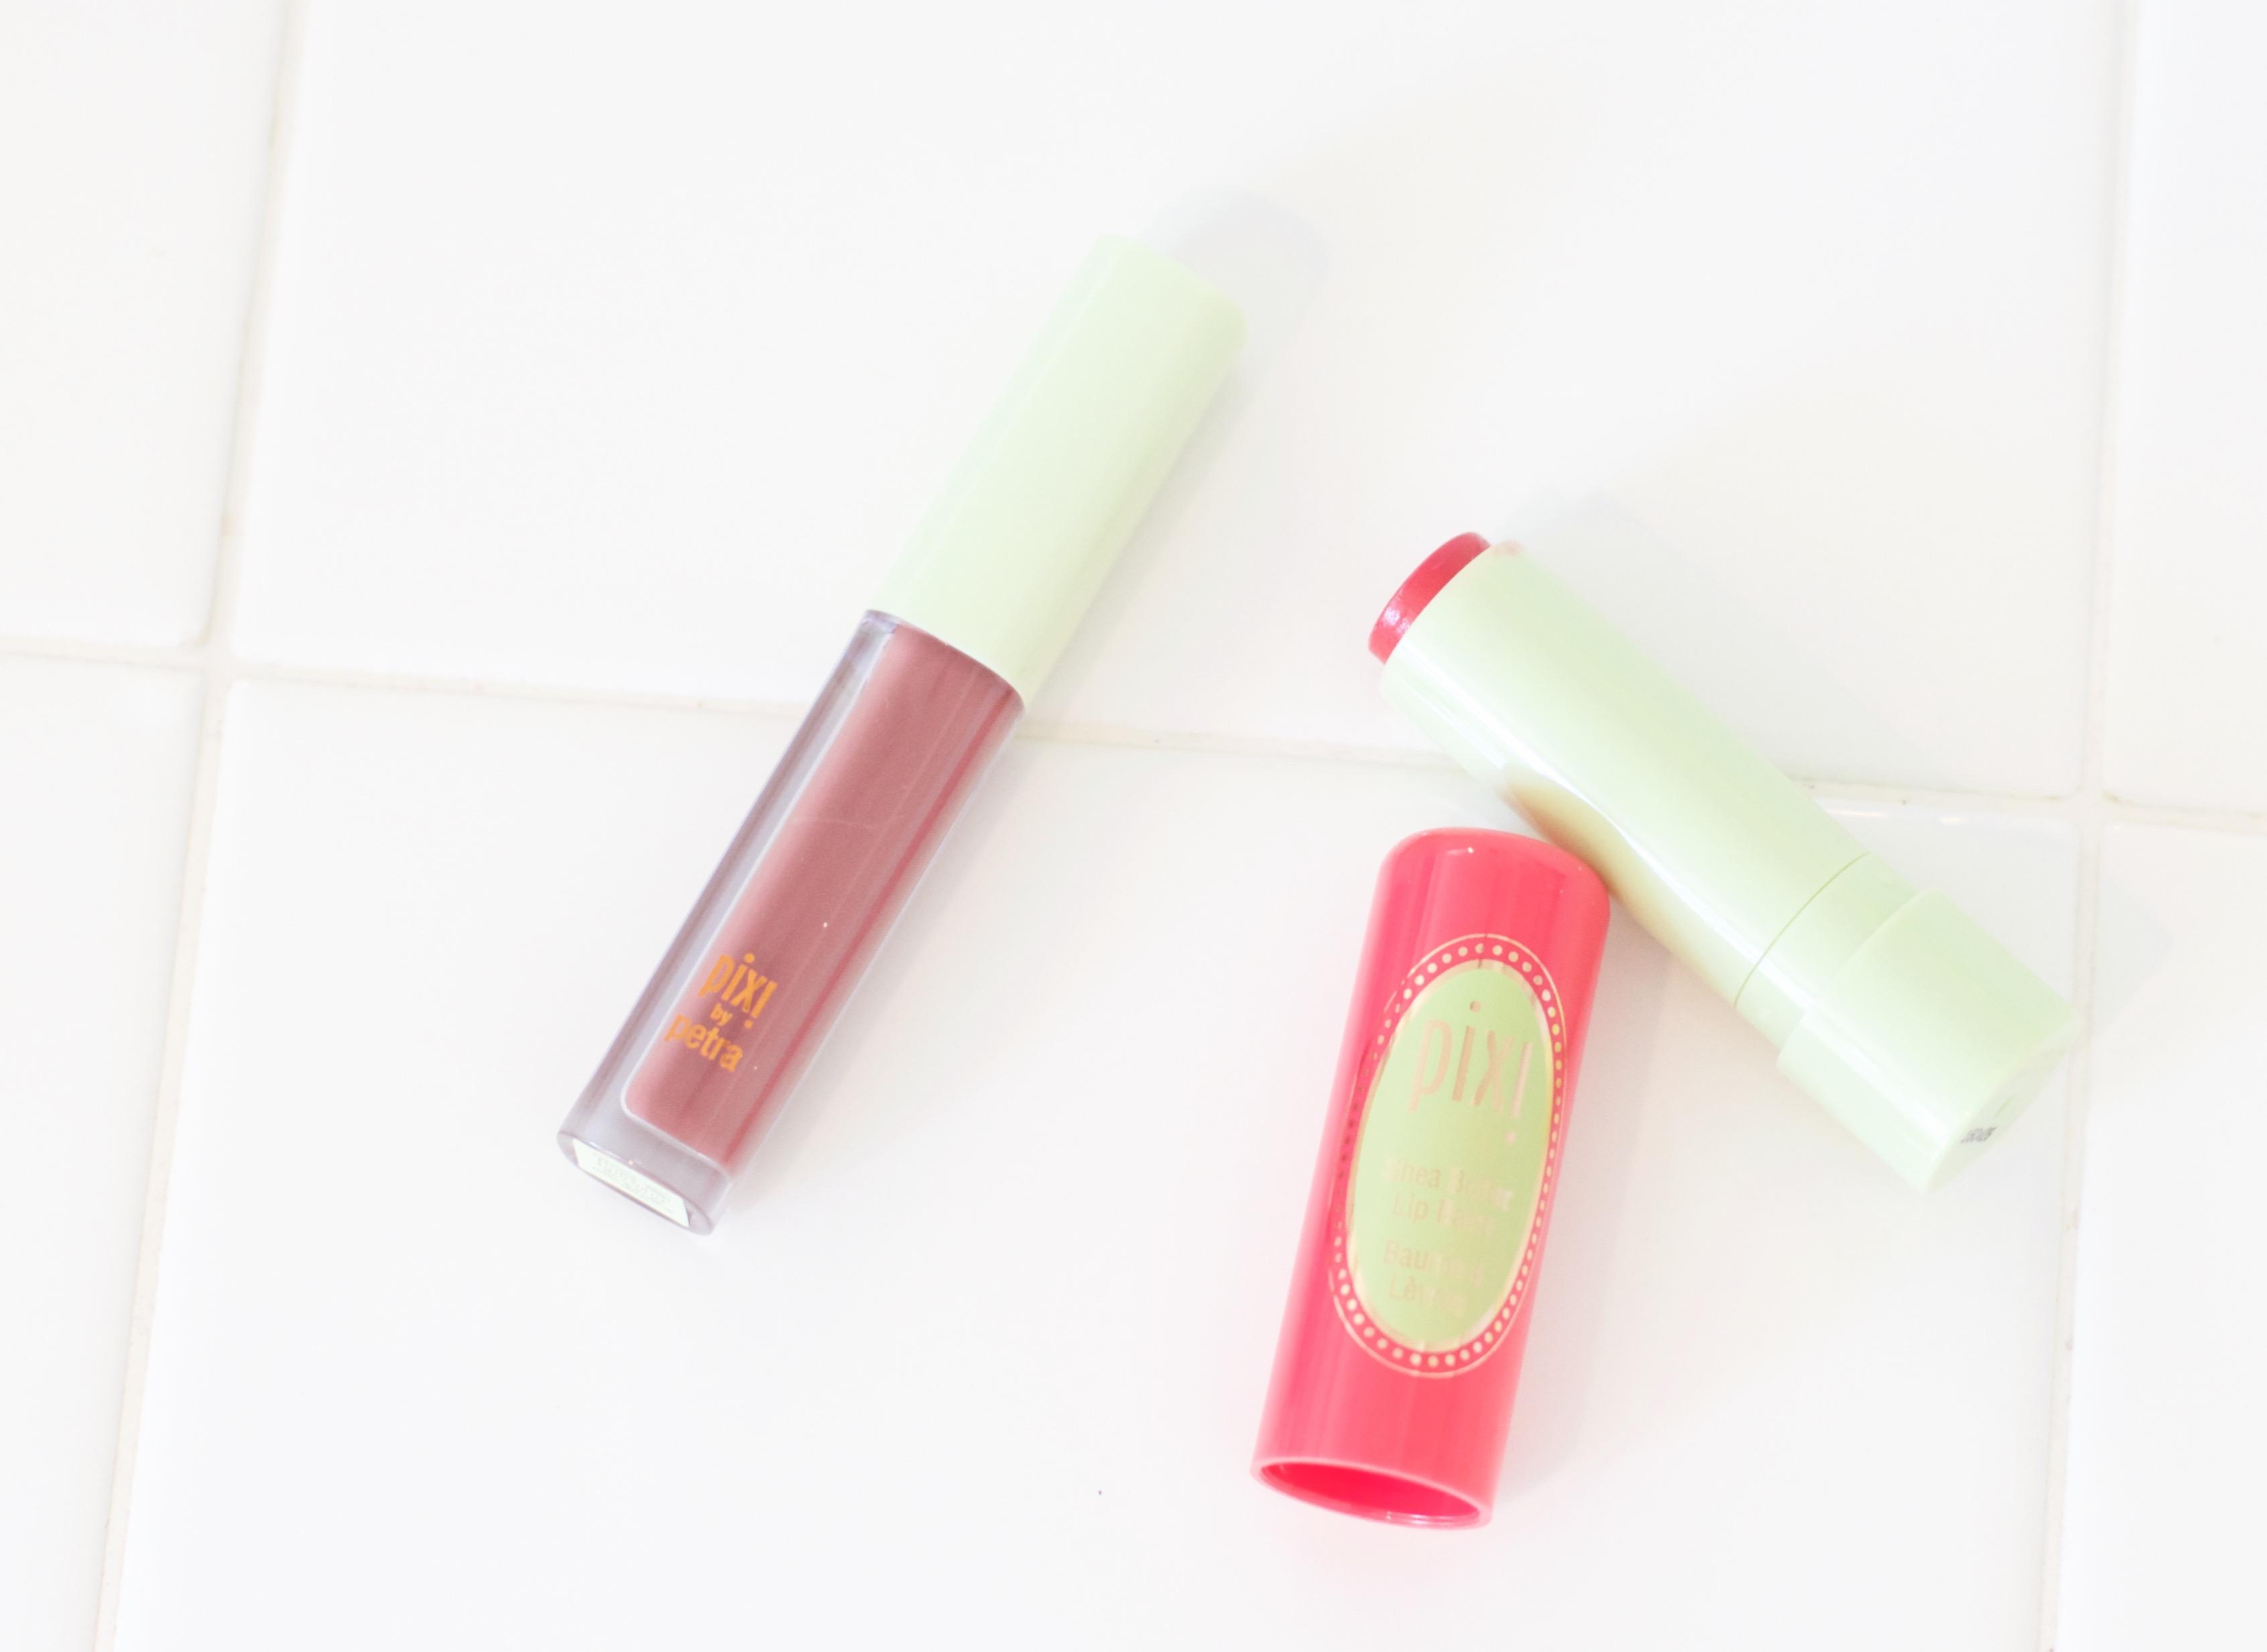 Pixi Liplift max lip gloss and shea butter lip balm review